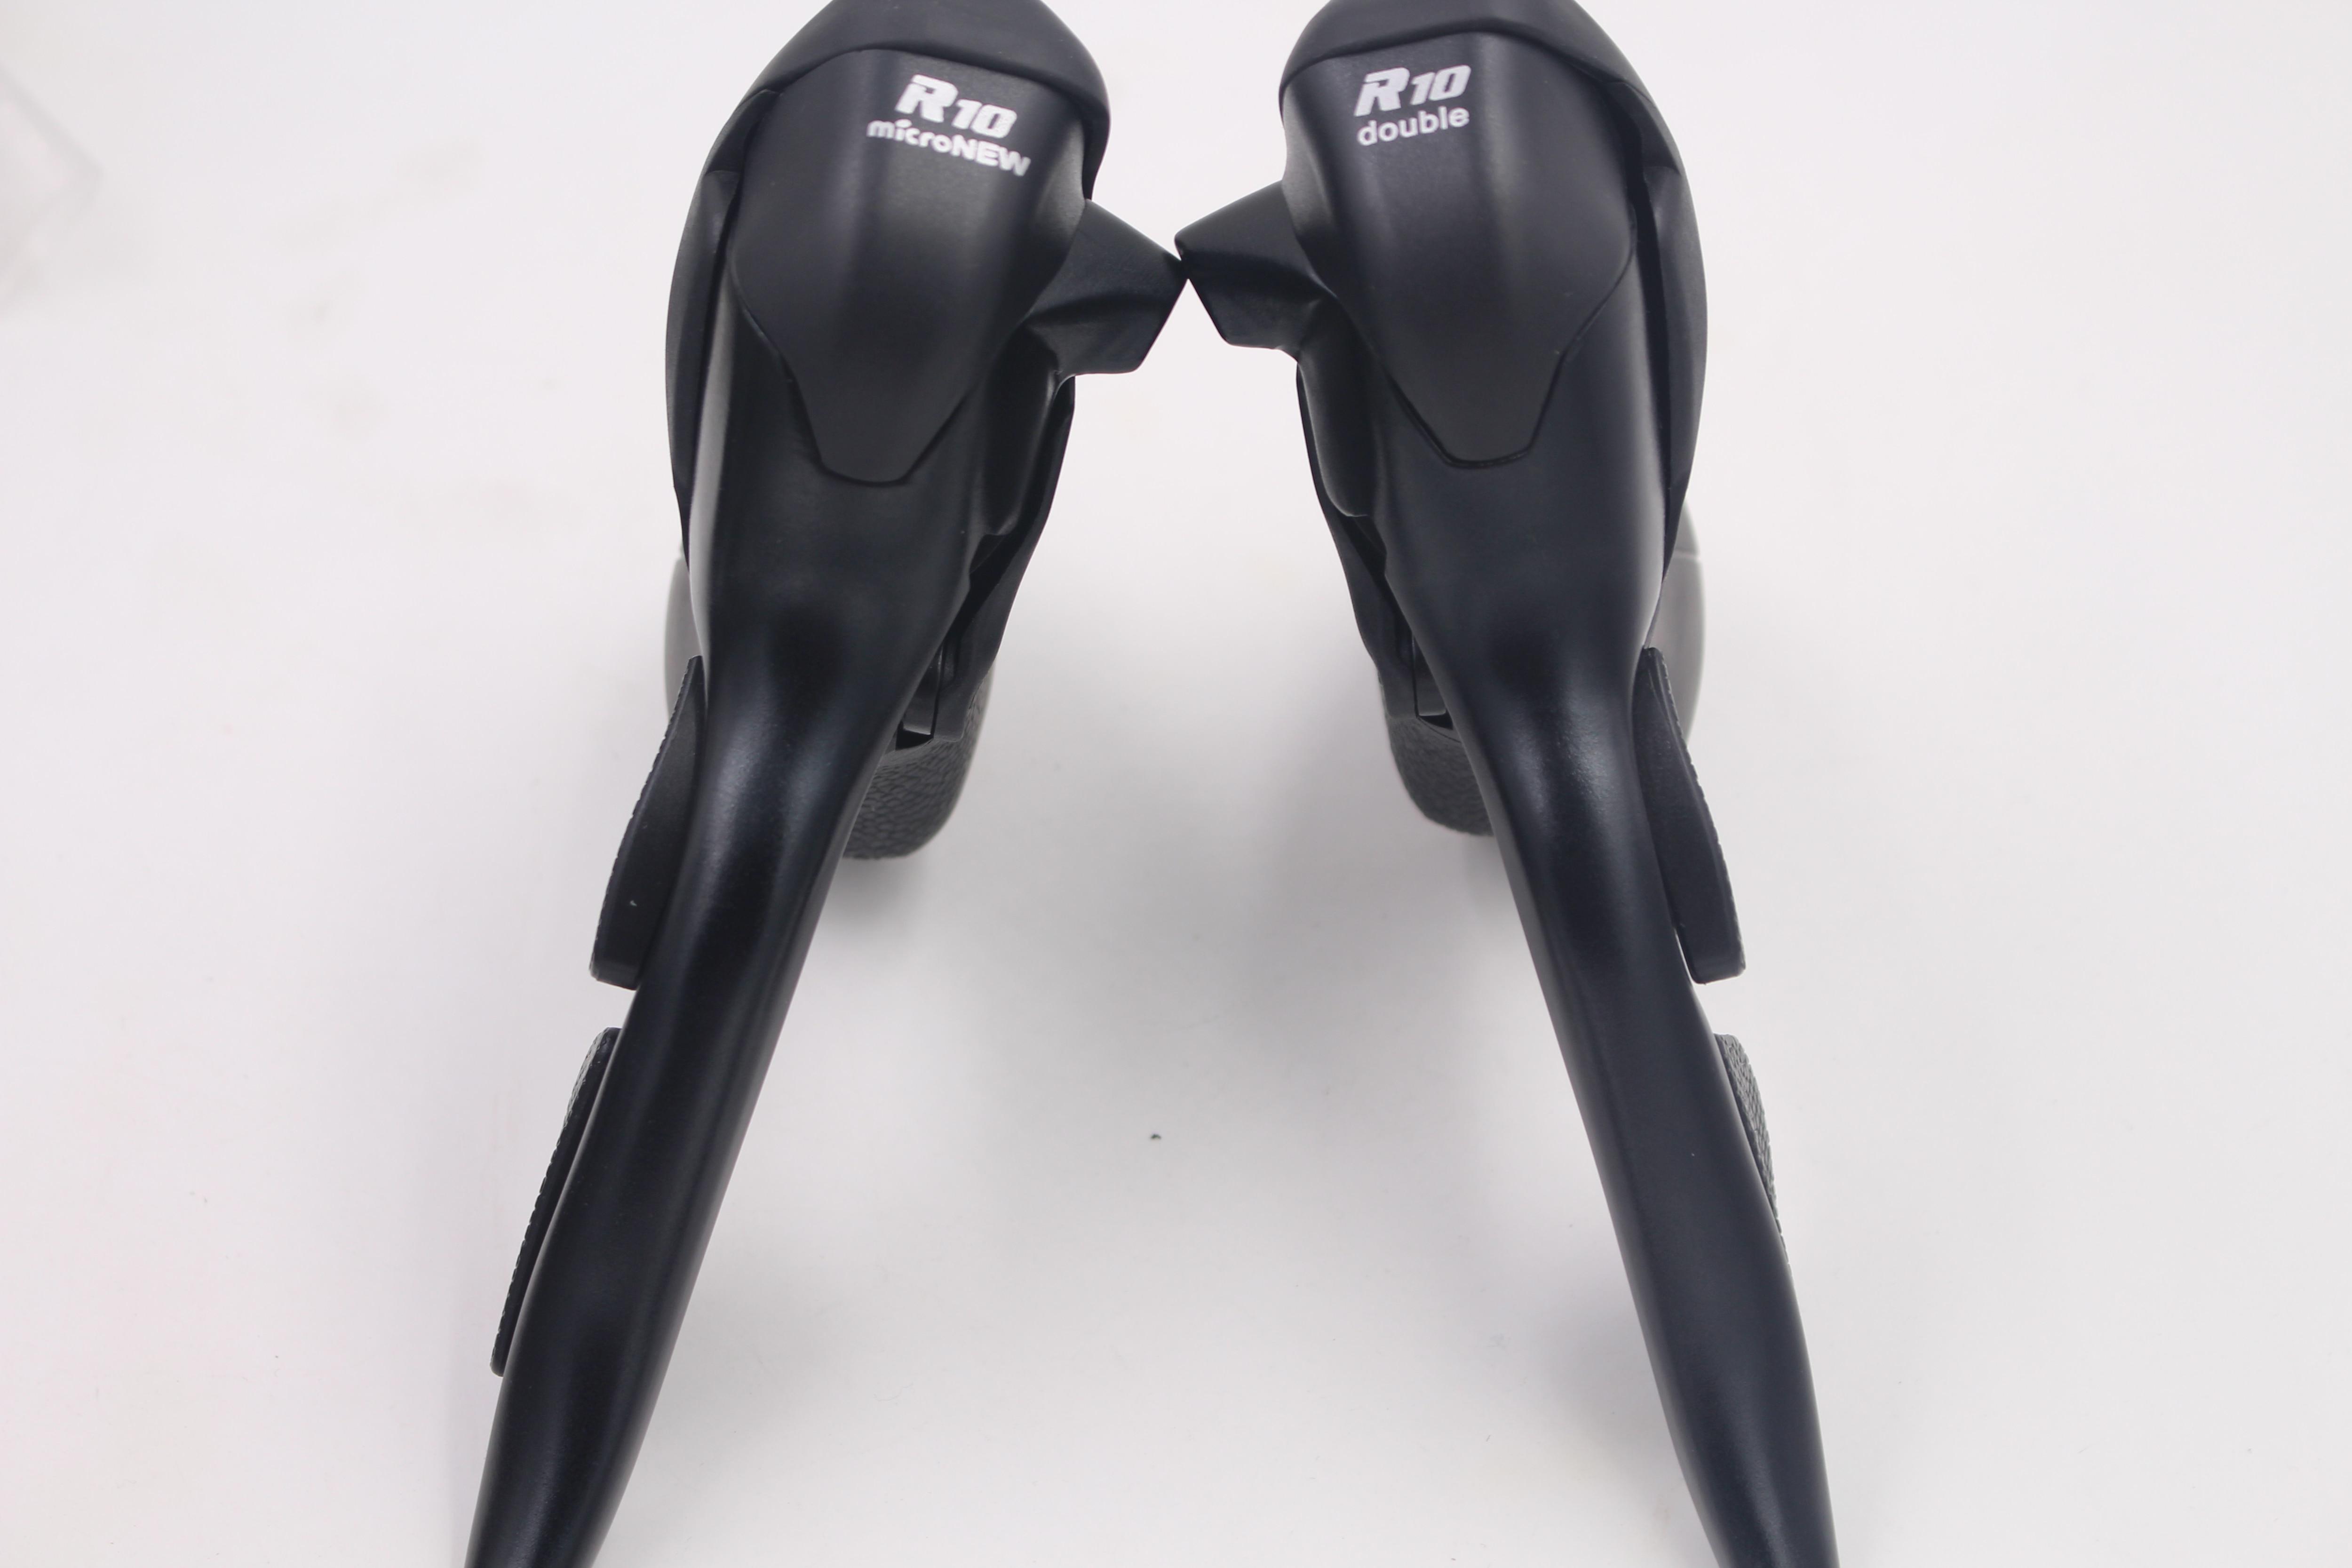 Дорожный велосипед микронев STI Shifters, 2x10 скоростей, совместим с Shimano 105 STI ST-5700 4600 Shifters Groupset